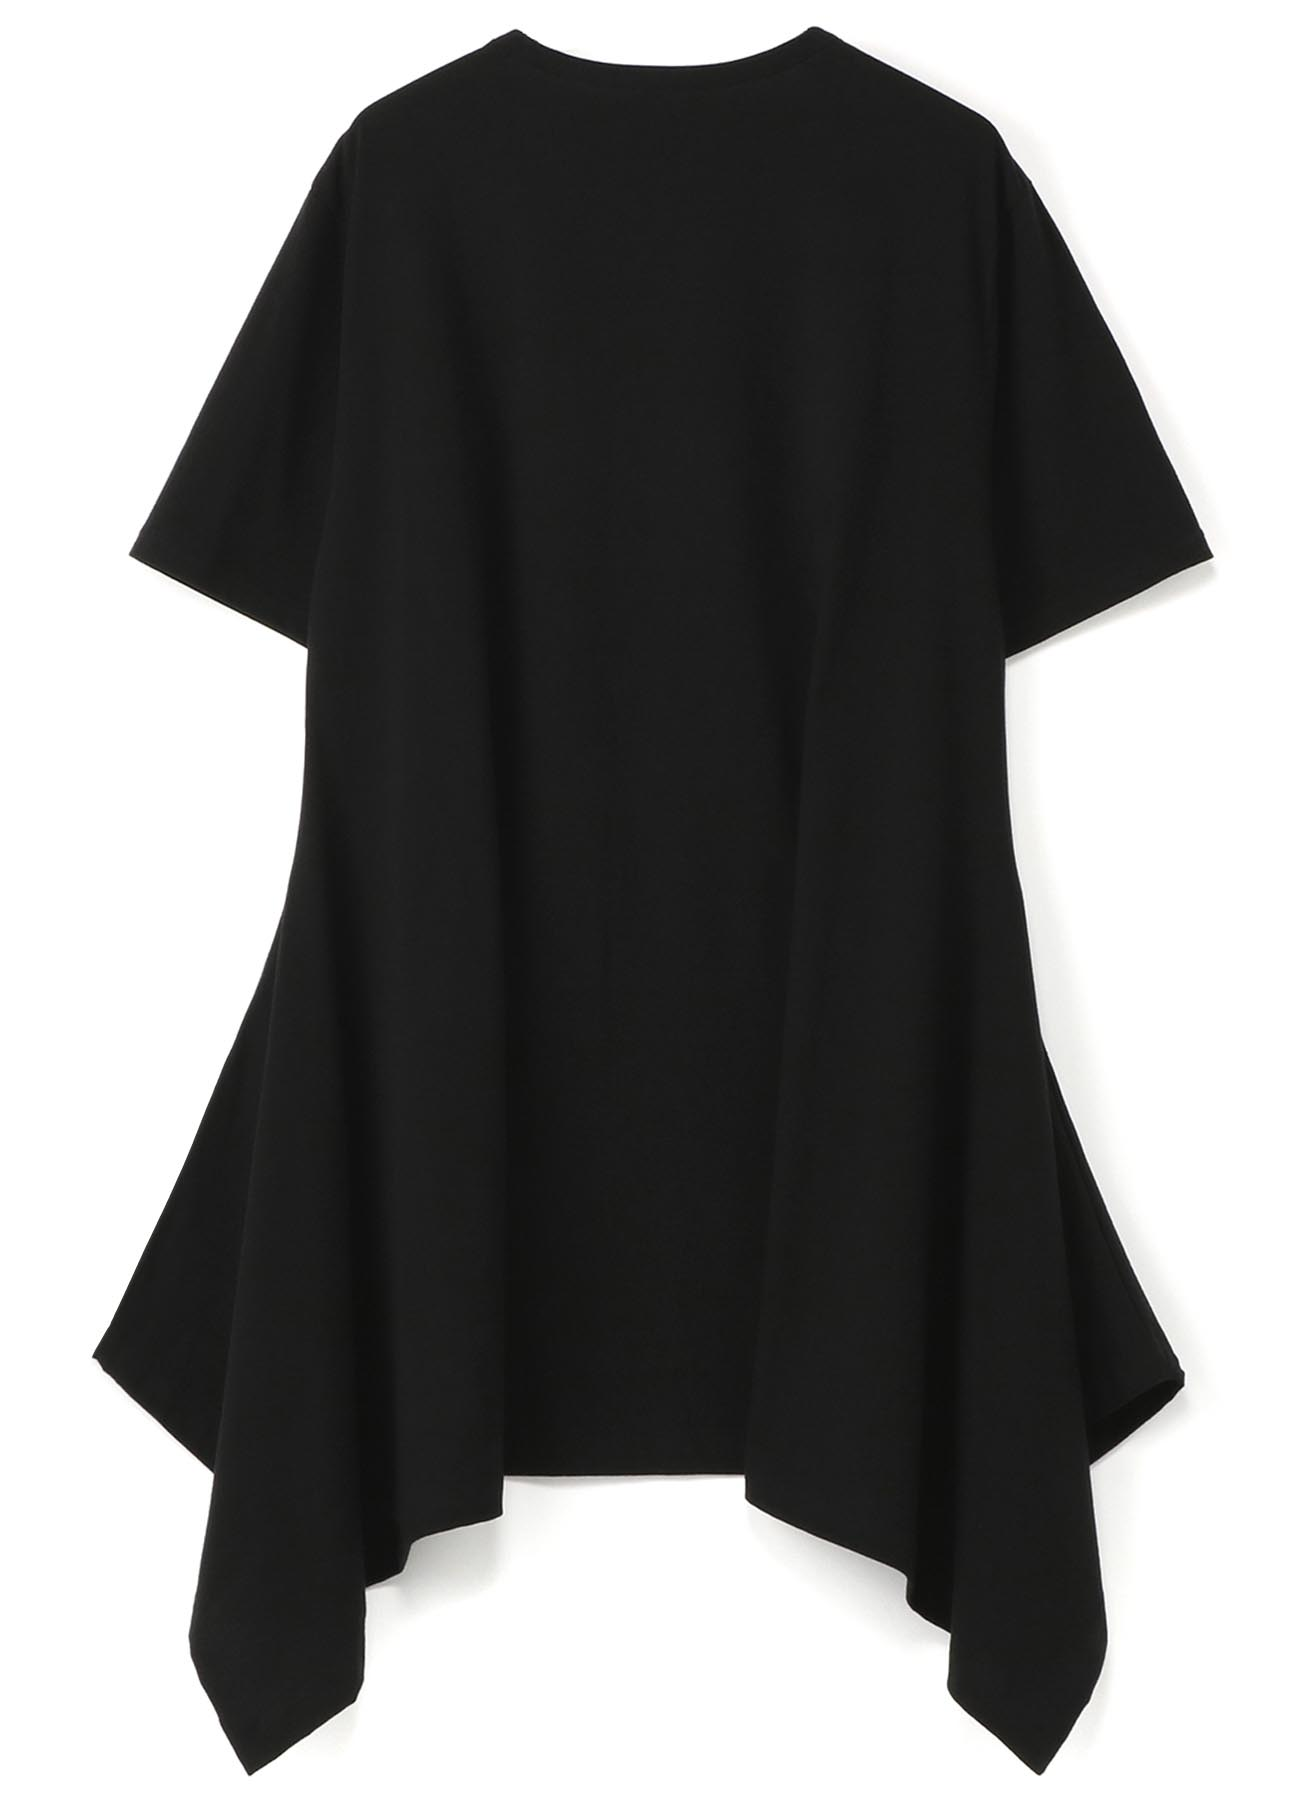 30/cotton Jersey Side Drape T